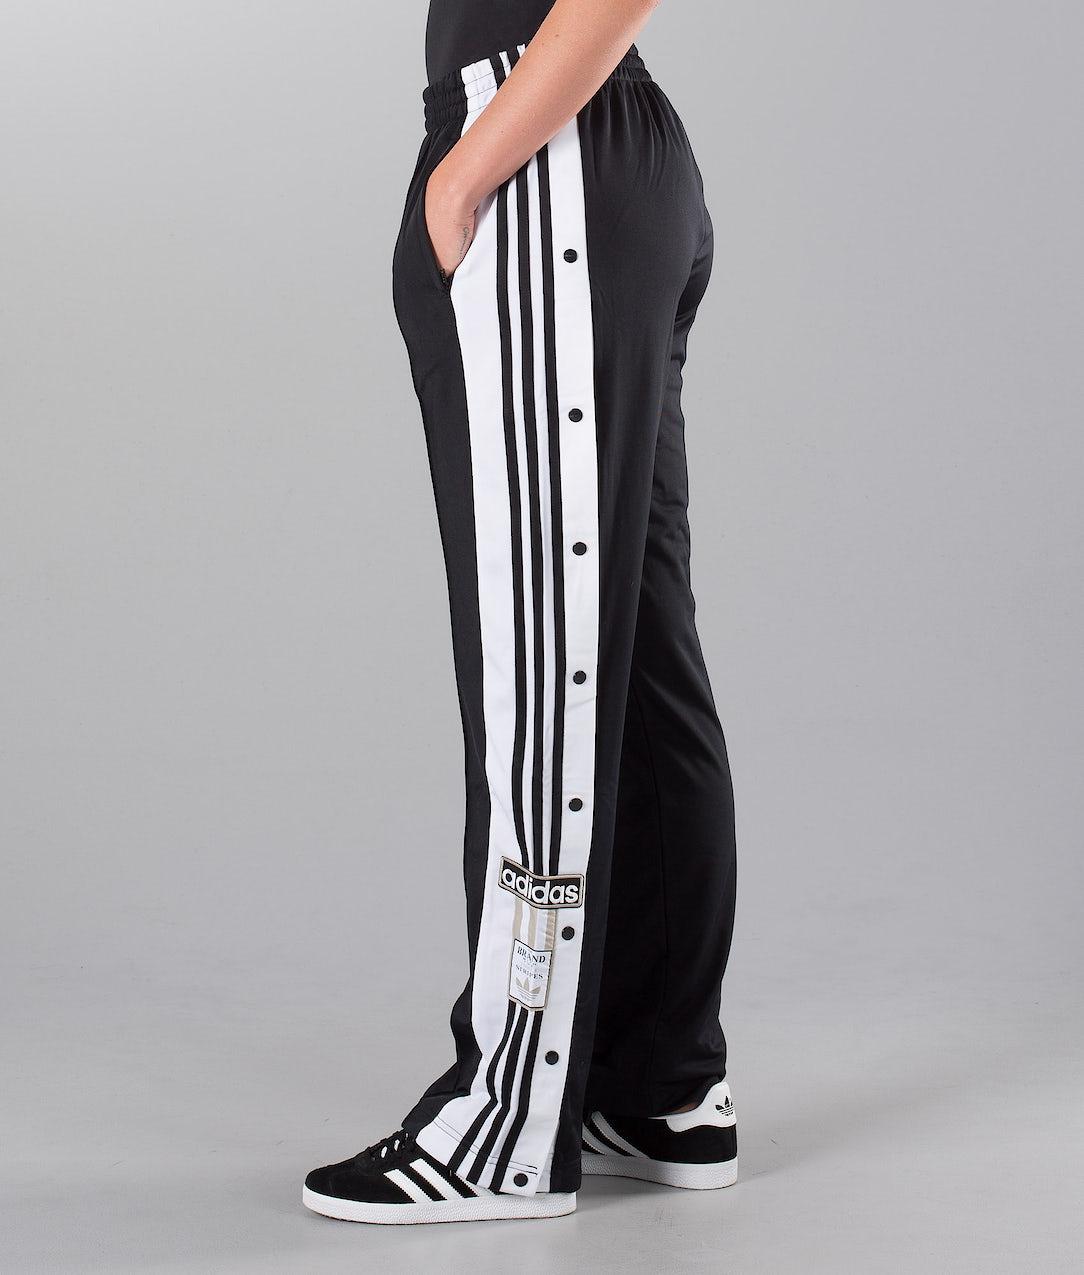 dobra tekstura jakość kupować nowe Adidas Originals Adibreak Spodnie Black/Carbon